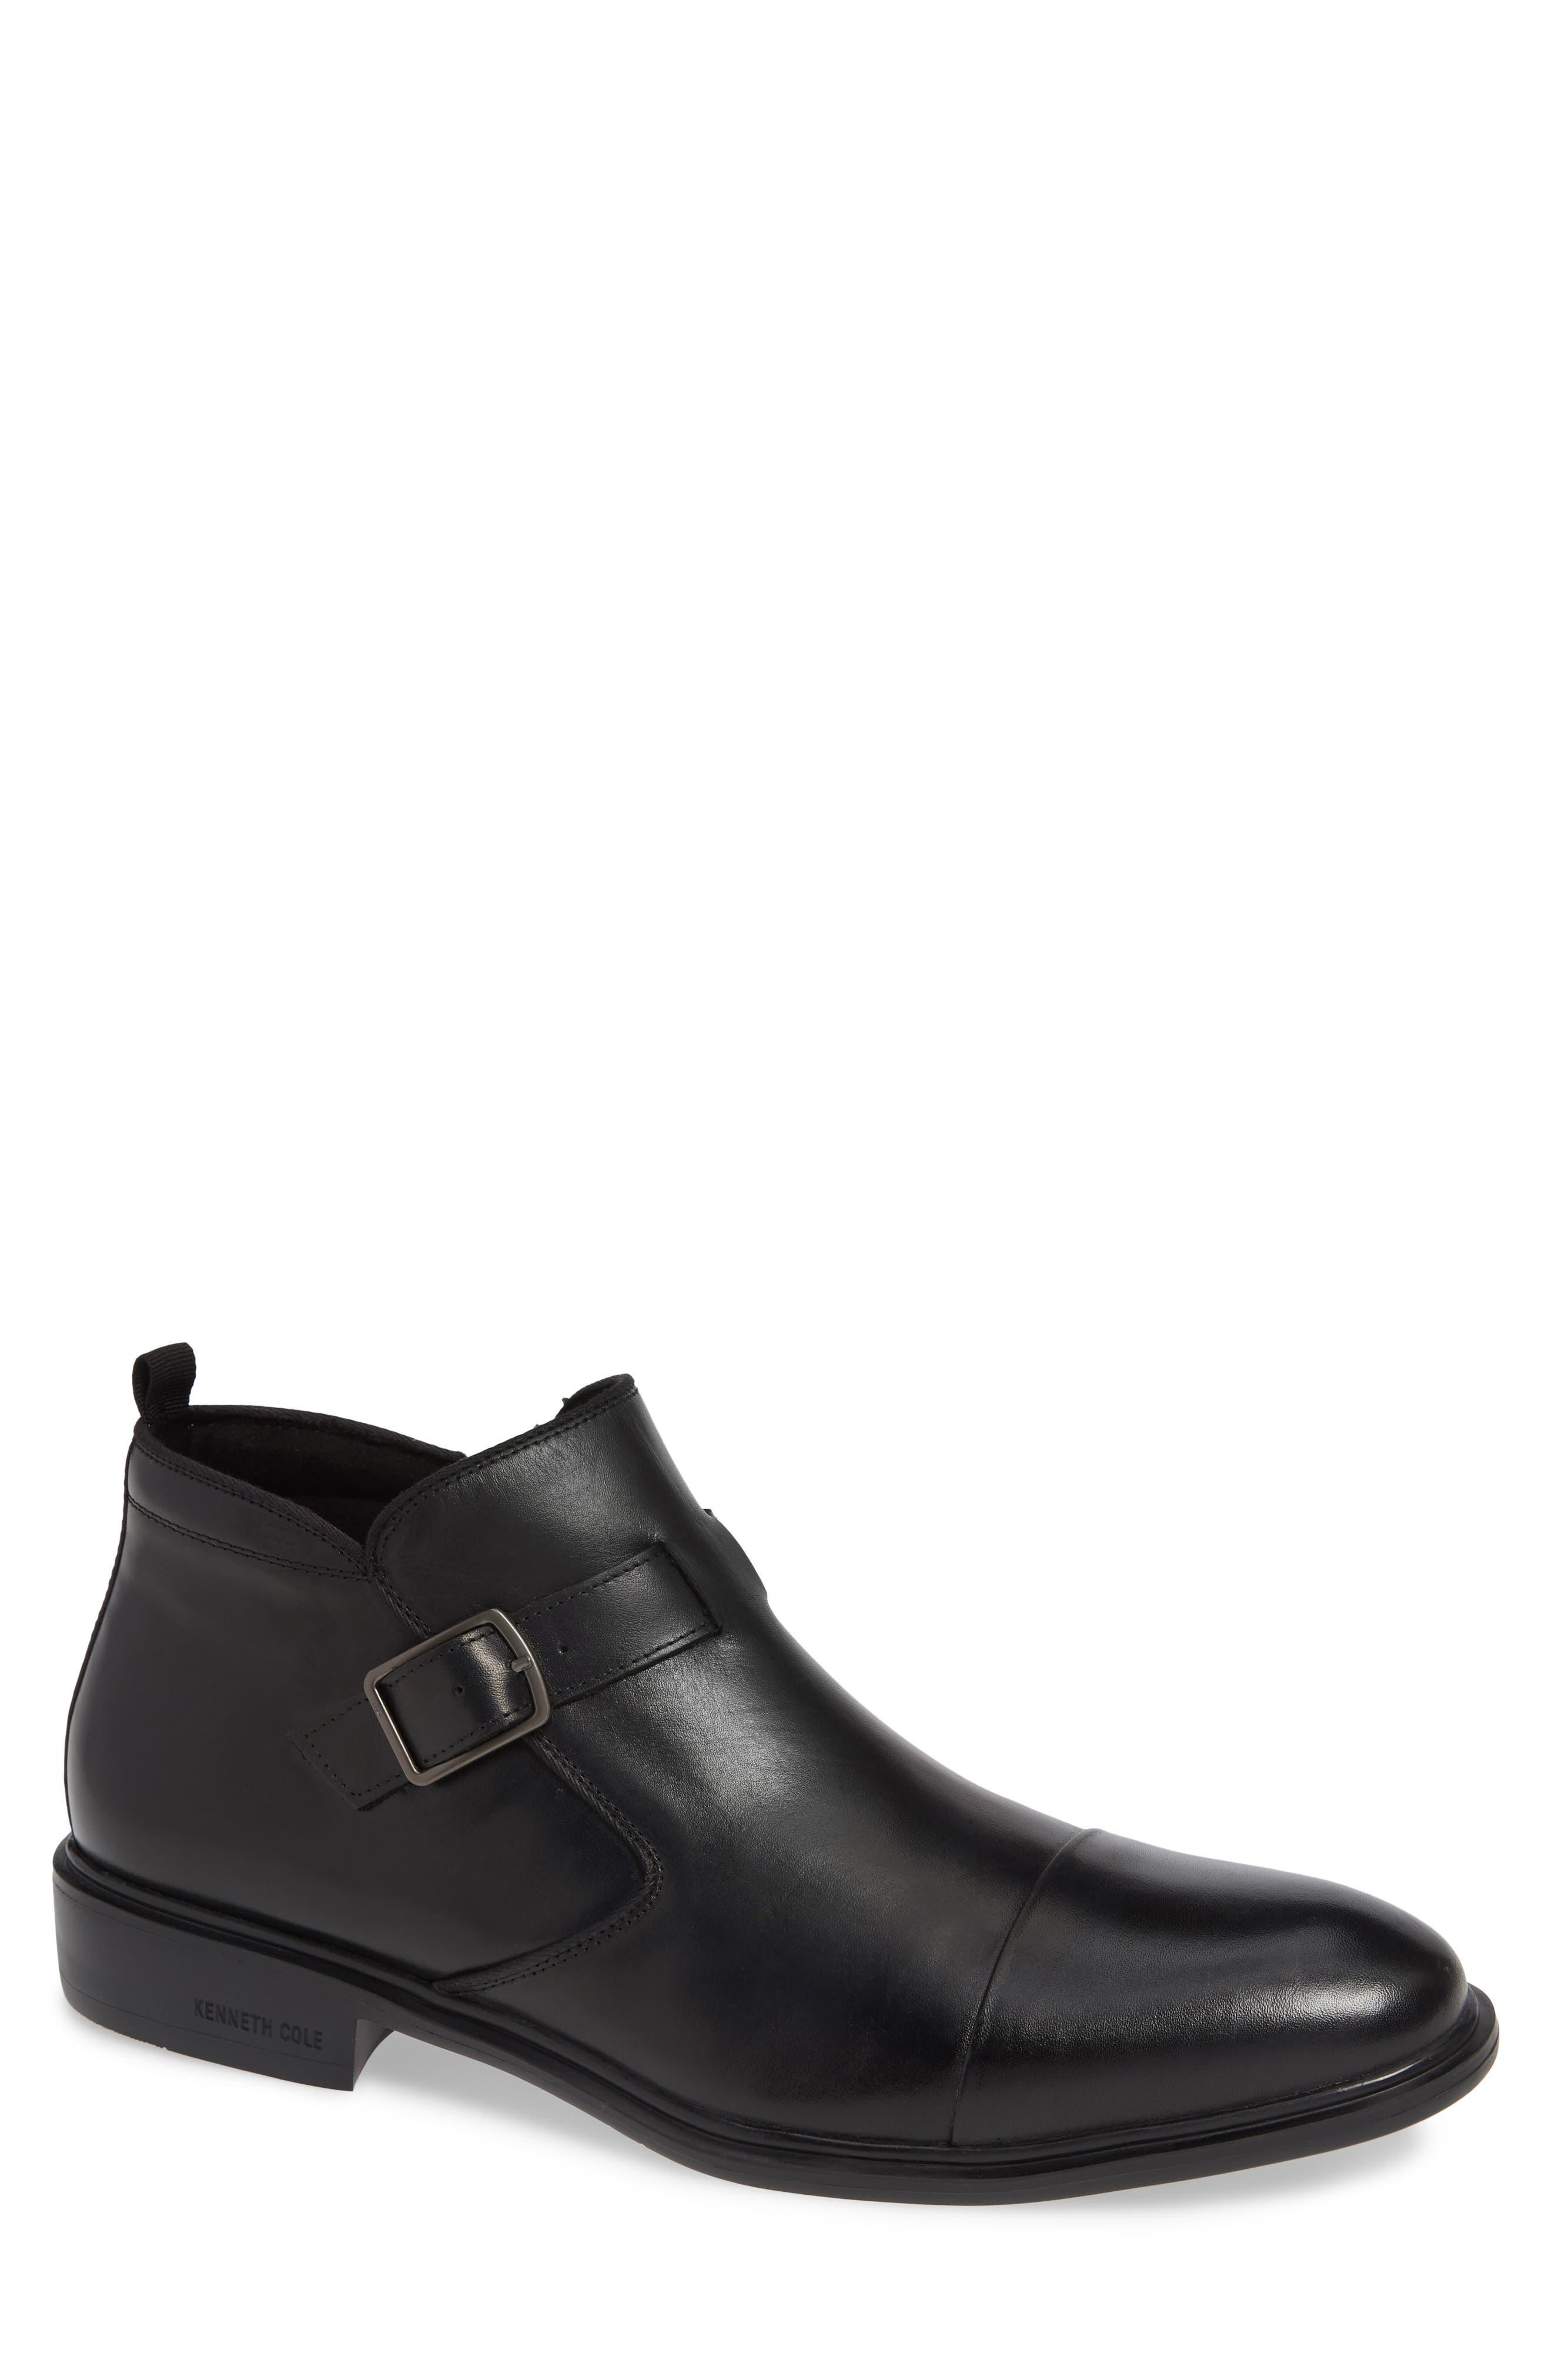 Garner Zip Boot,                         Main,                         color, BLACK LEATHER